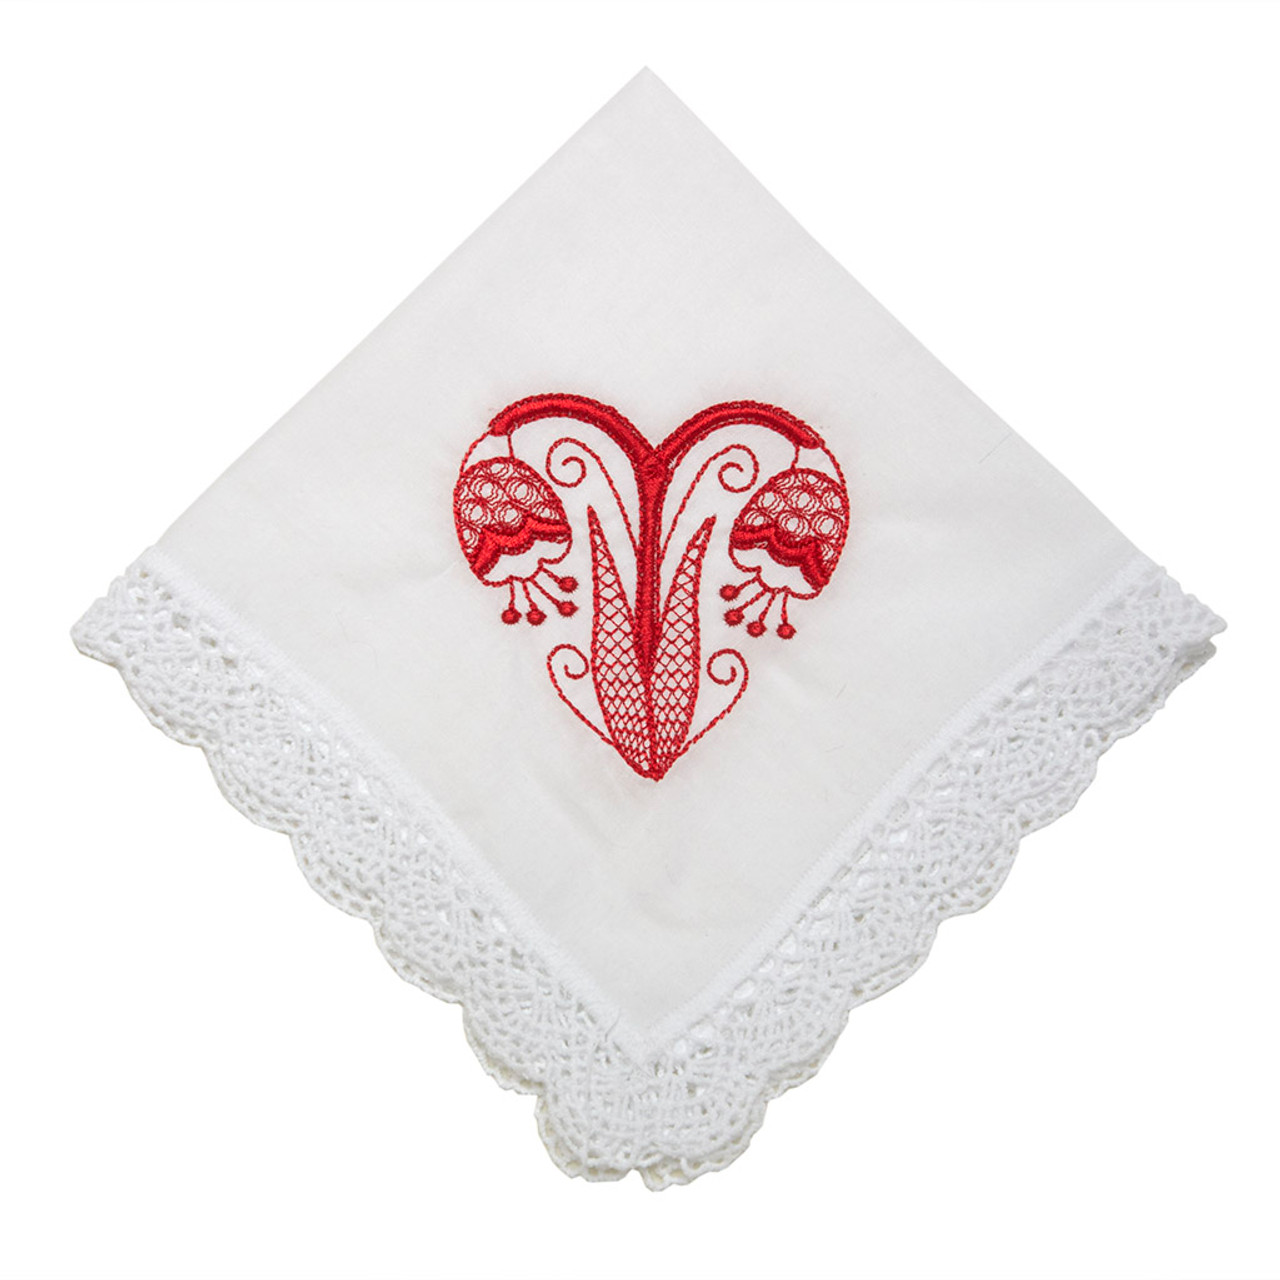 1 Handkerchief 23 cm heart and more